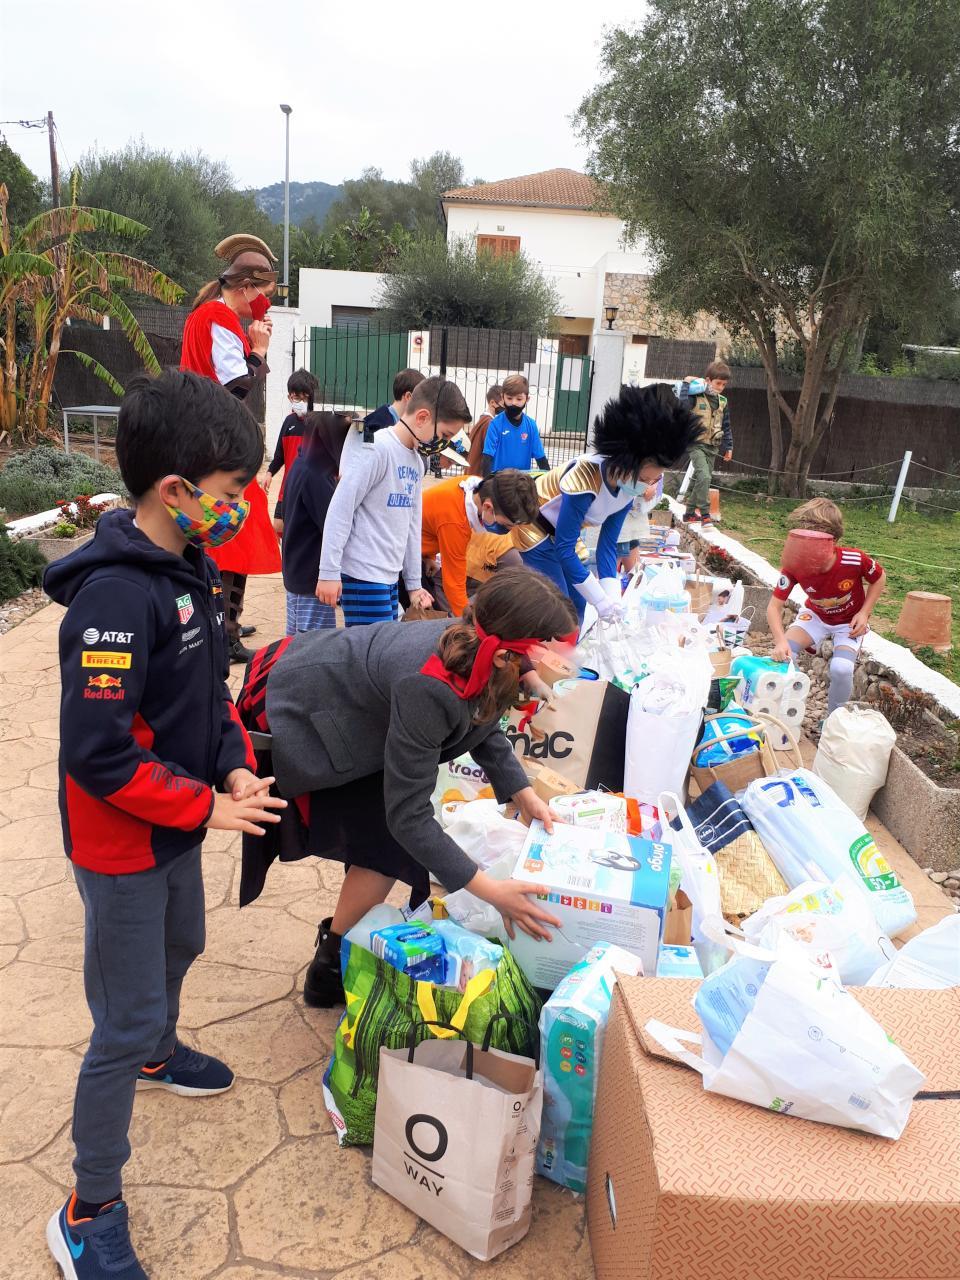 Mallorca international School students